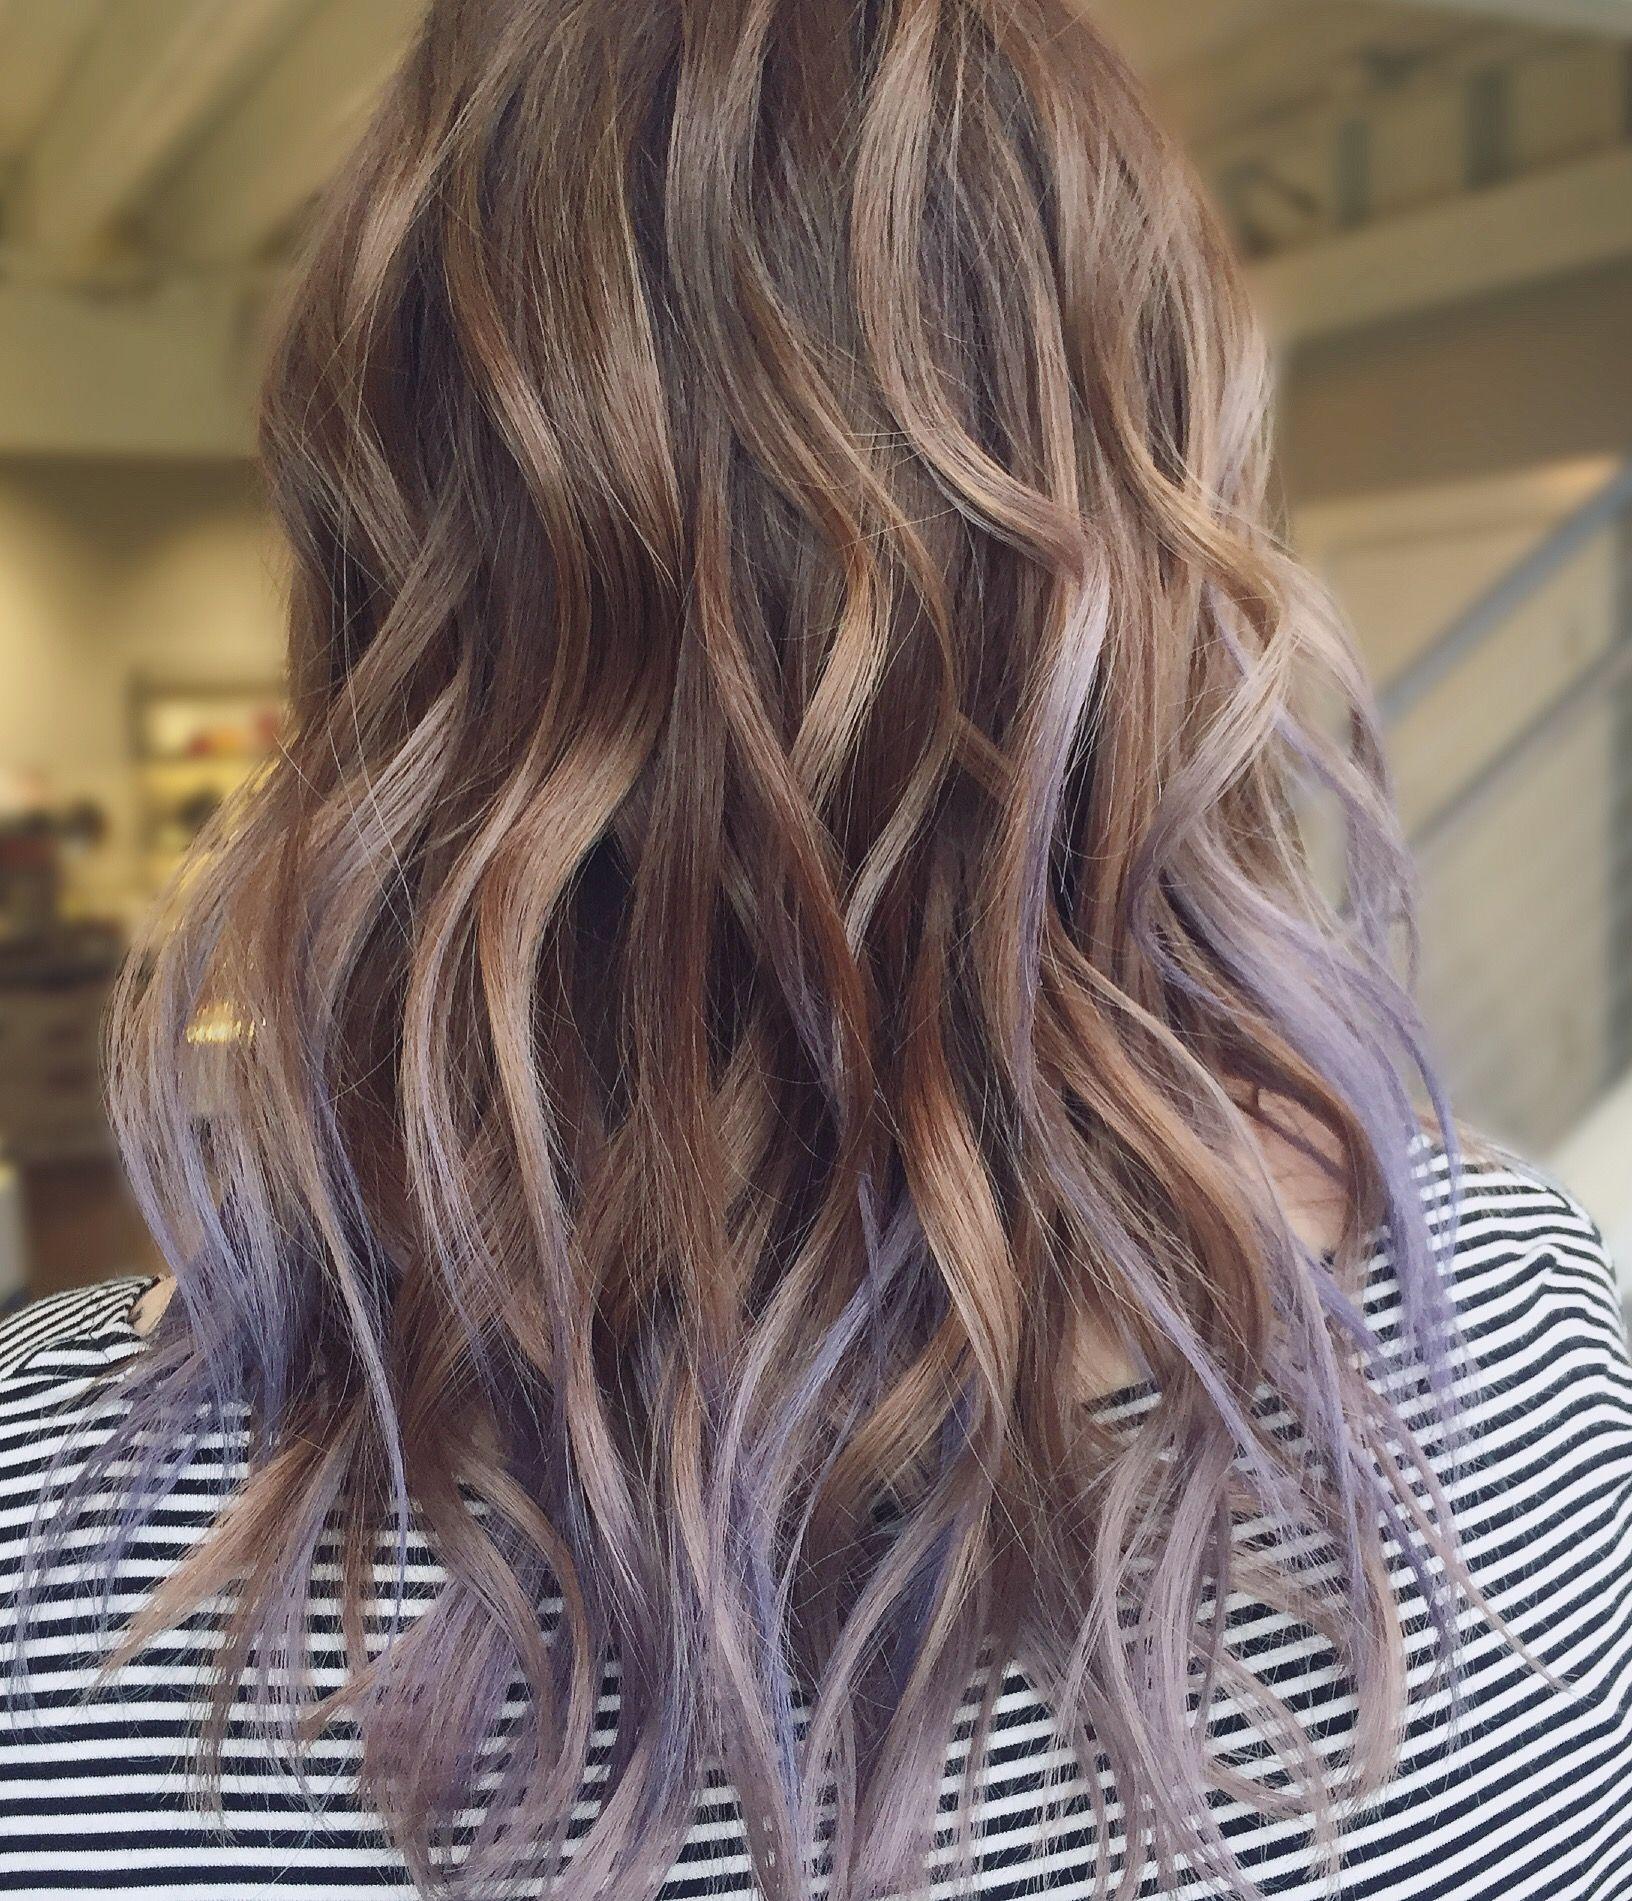 Lavender Lilac Balayage Hair In 2019 Hair Dyed Hair